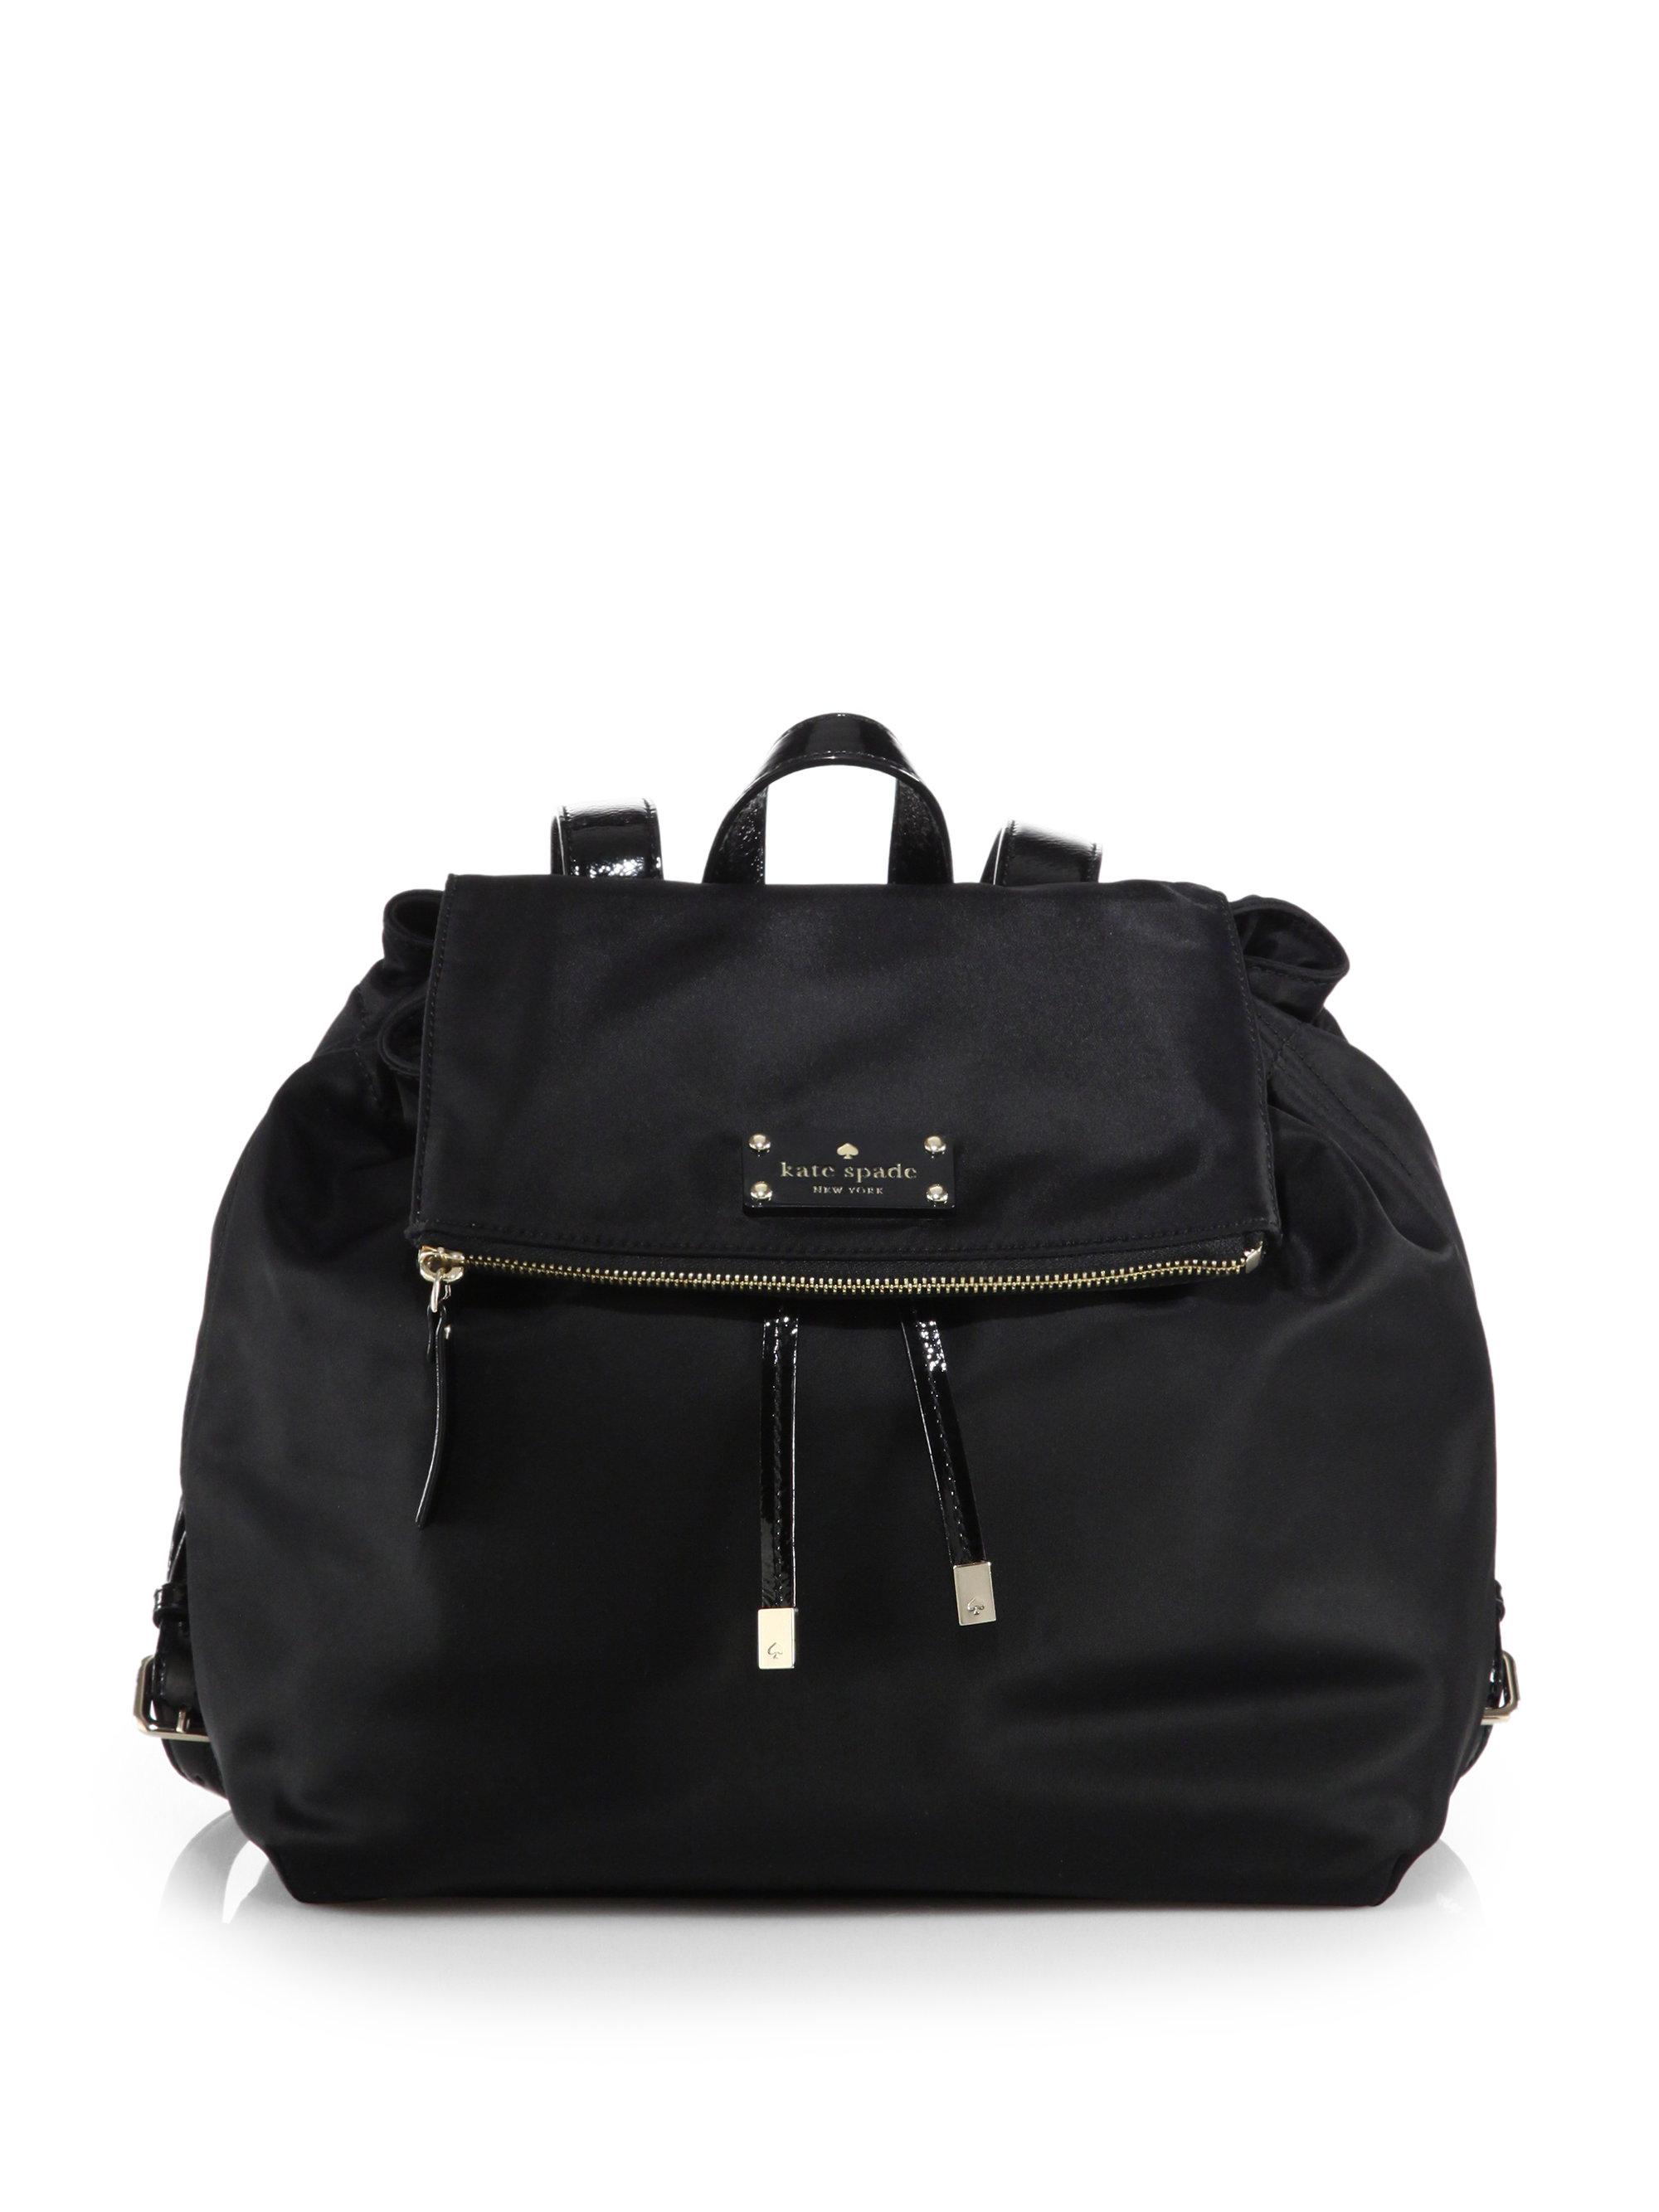 Kate Spade Nylon Backpack in Black | Lyst